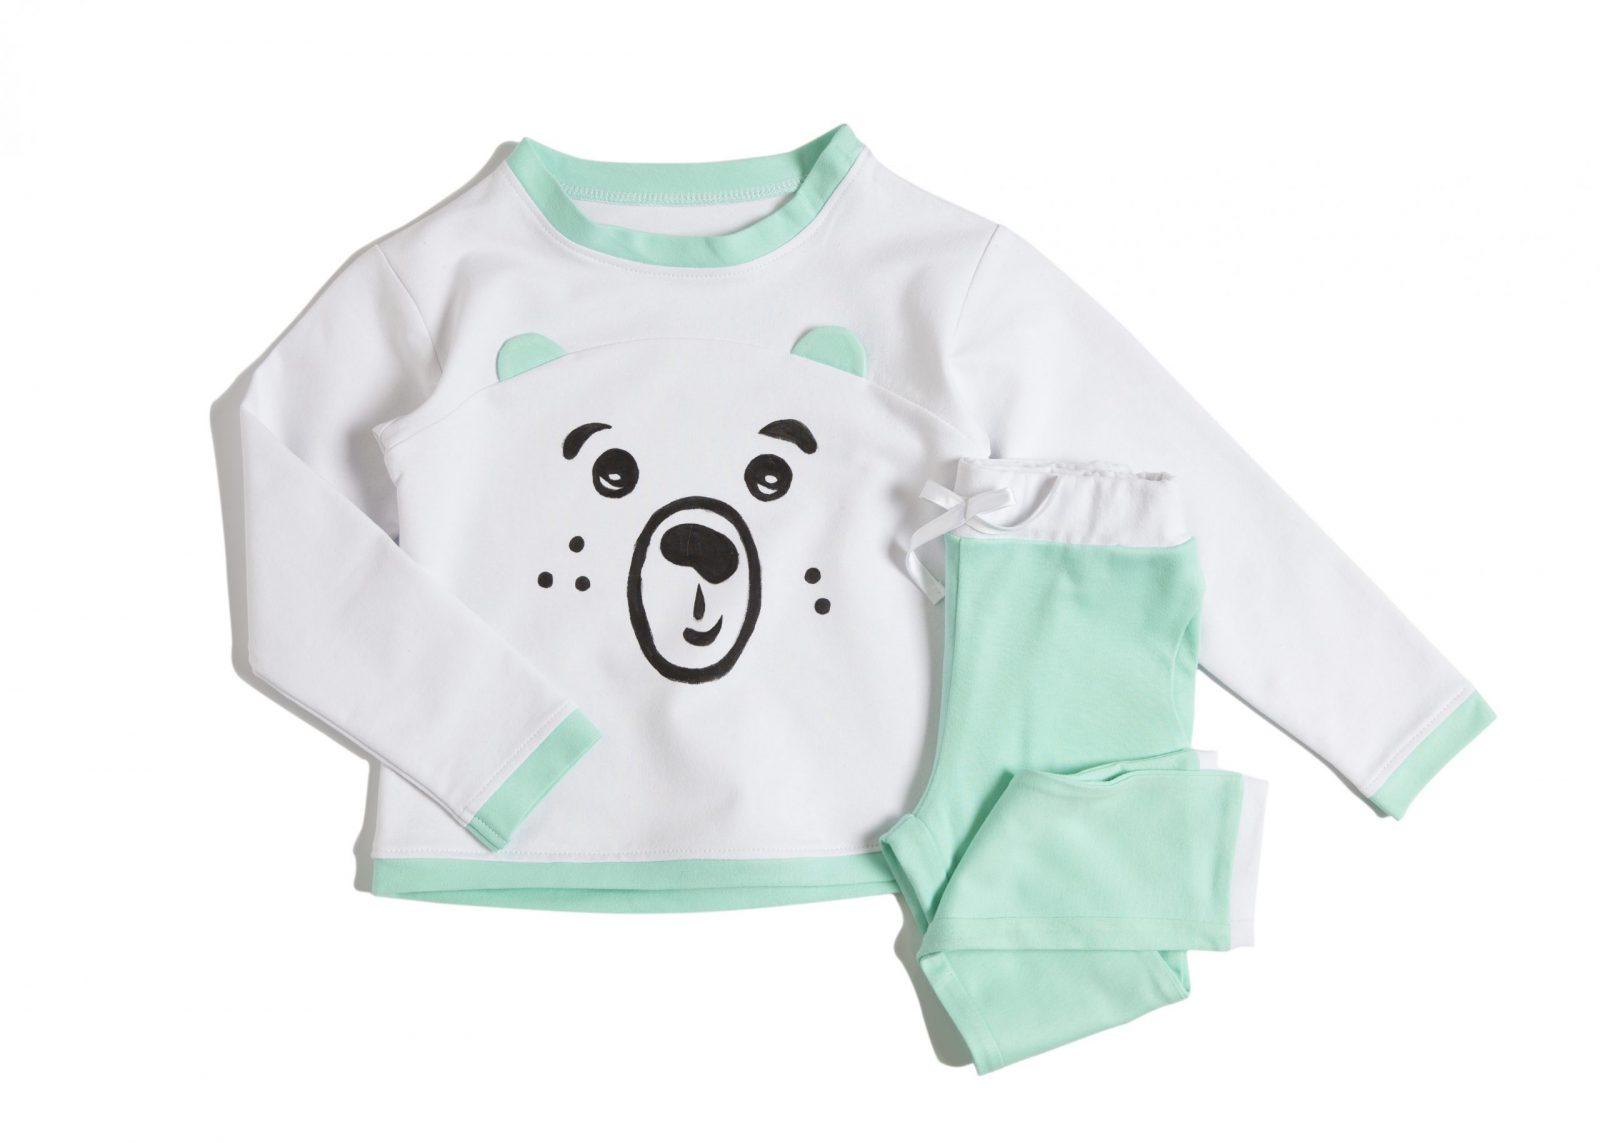 Criterii de avut in vedere in alegerea unor pijamale pentru copii